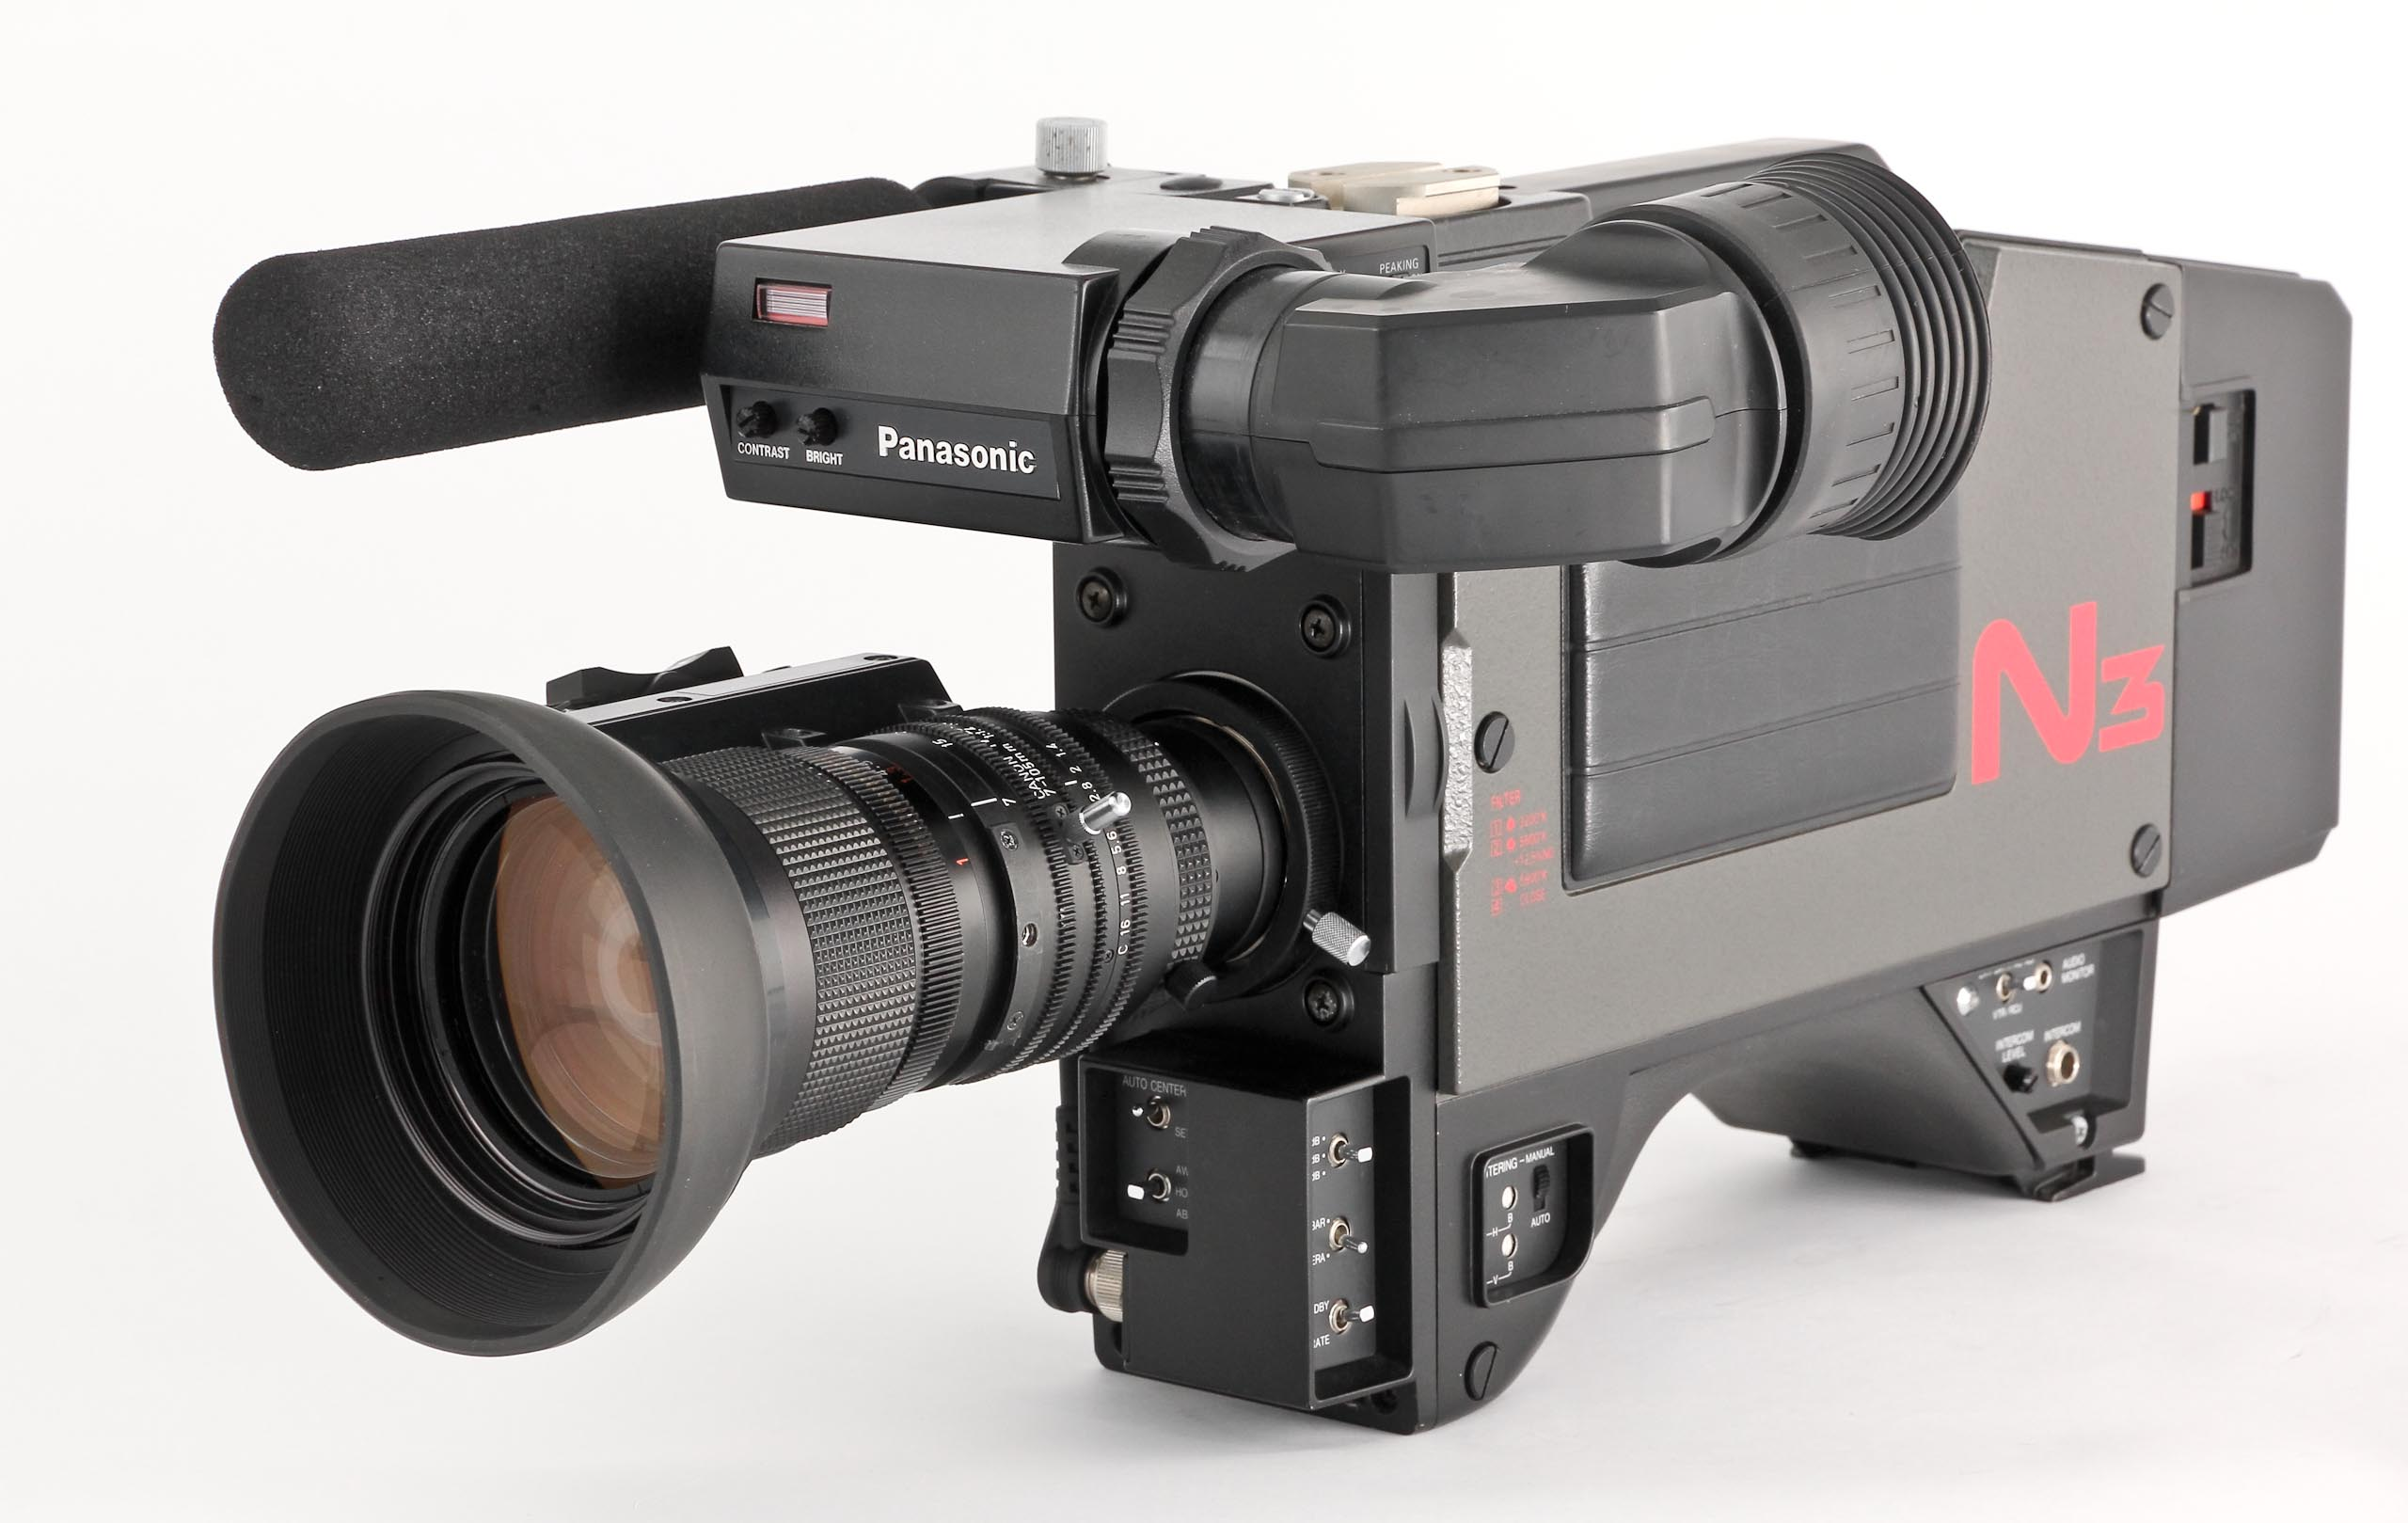 Panasonic-WV-N3 - 3